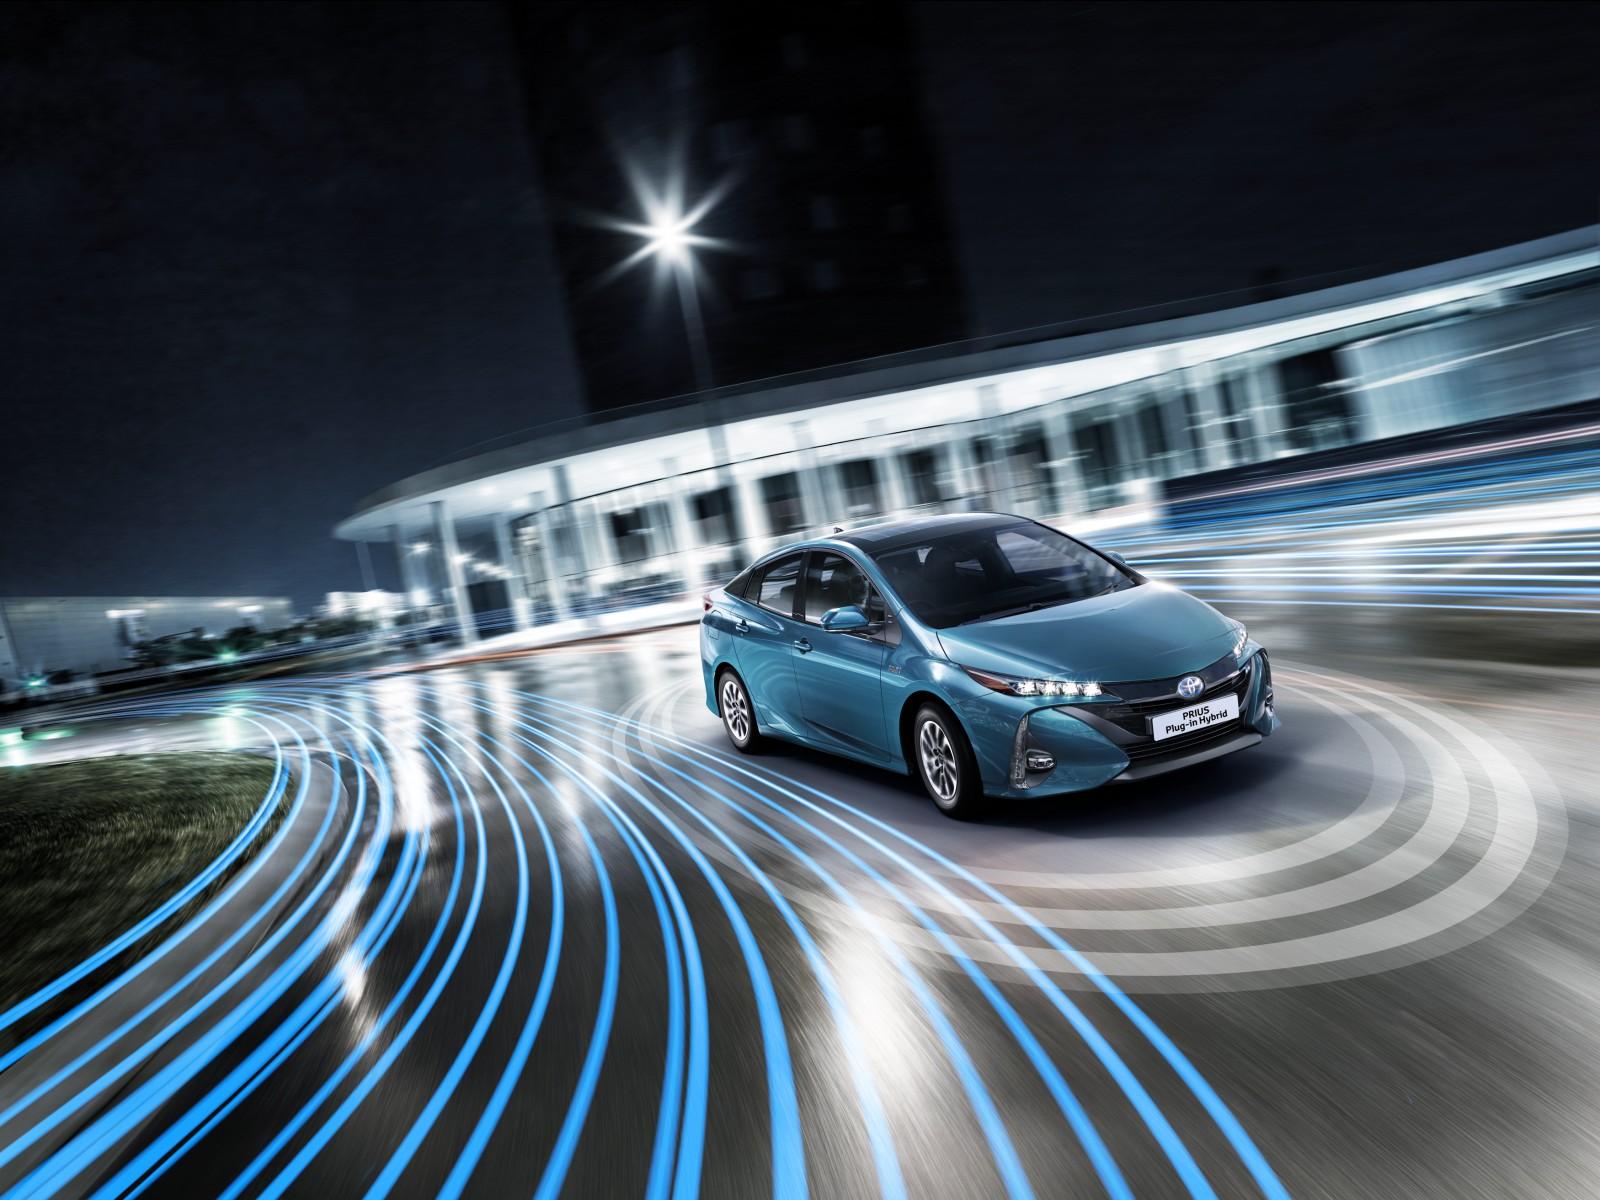 Toyota Prius Plug In Hybrid Ev Range Extending Adding A 2nd Hv Battery